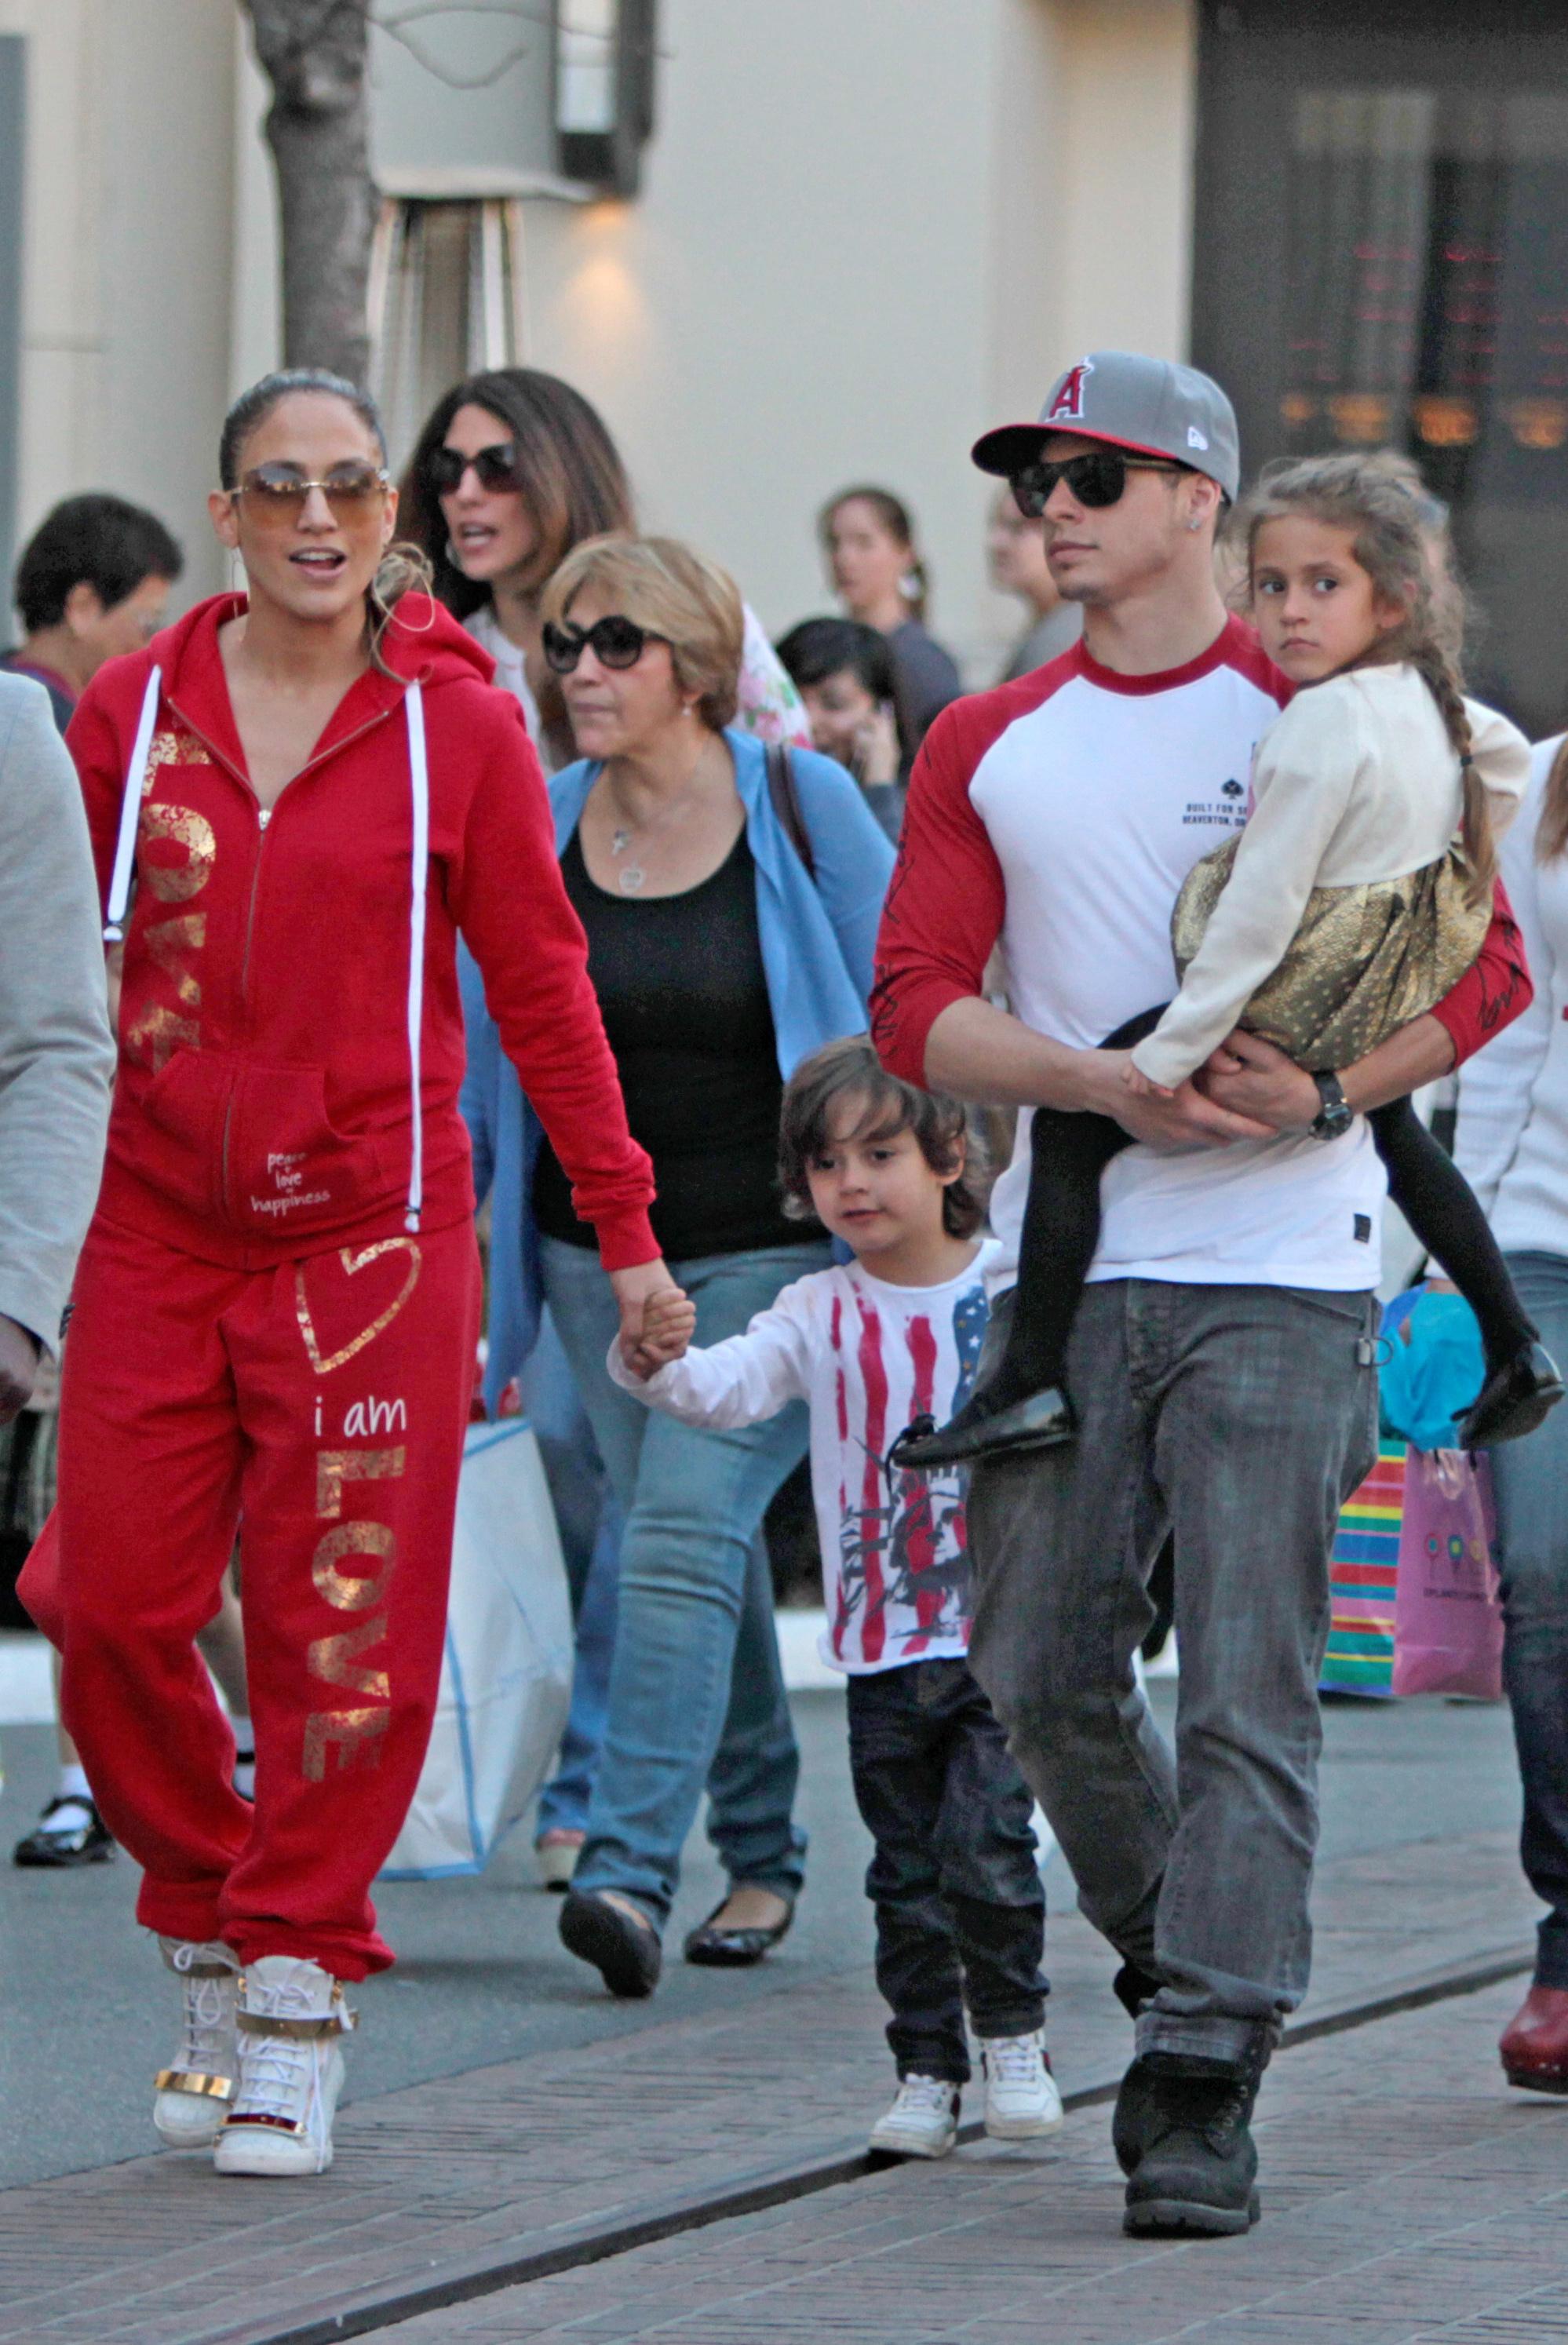 Jennifer lopez max emme casper smart the grove red track suit